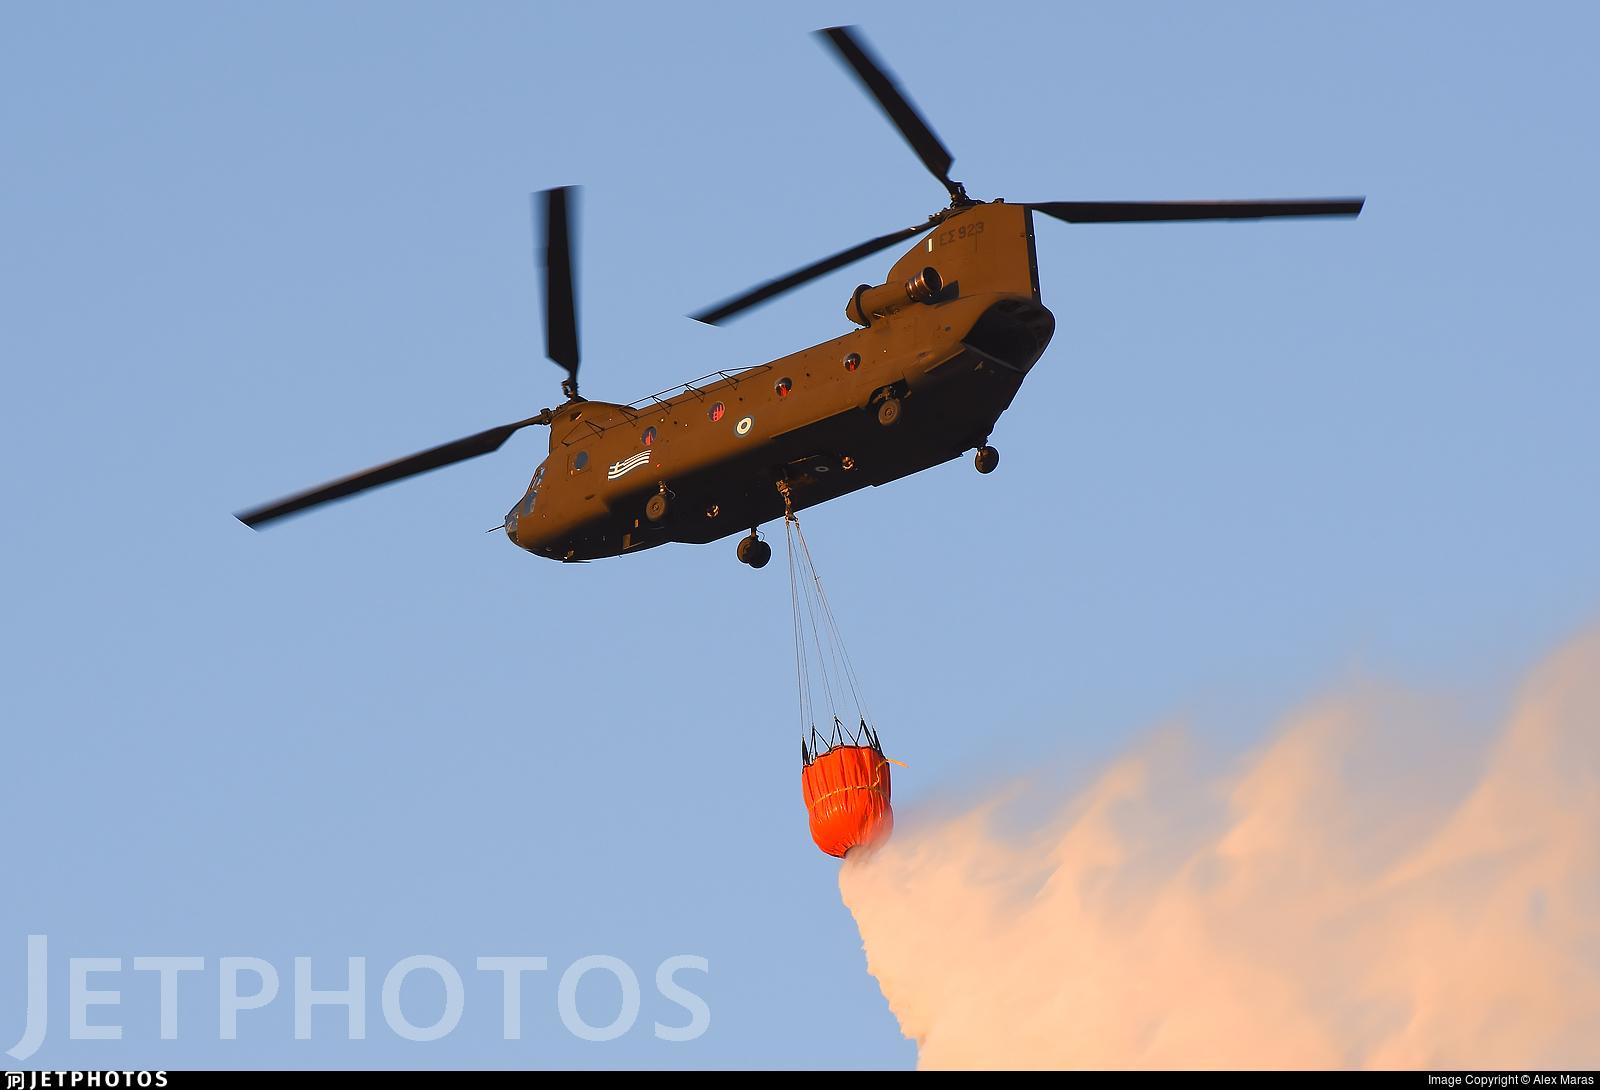 ES923 - Boeing CH-47D Chinook - Greece - Army